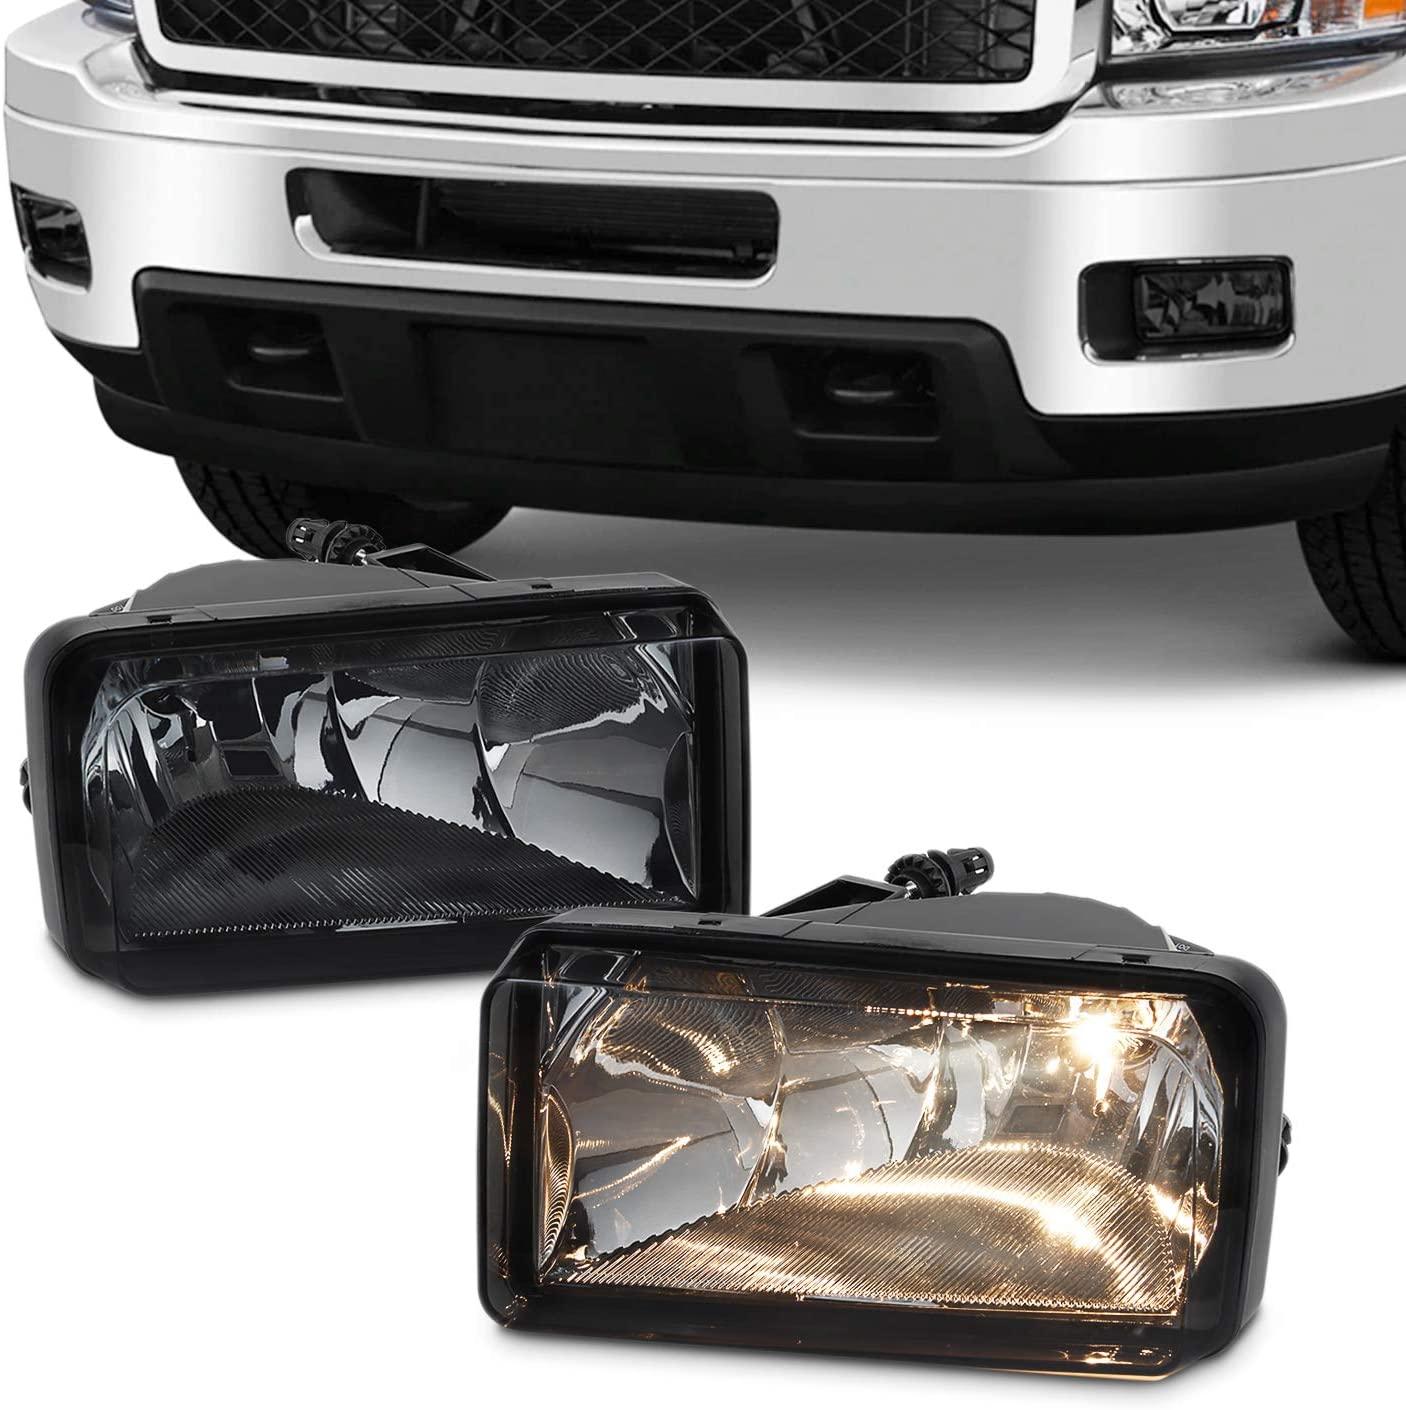 For 2007-2013 Chevy Silverado Suburban Tahoe Avalanche Bumper Smoke Fog Lights w/Bulbs Replacement